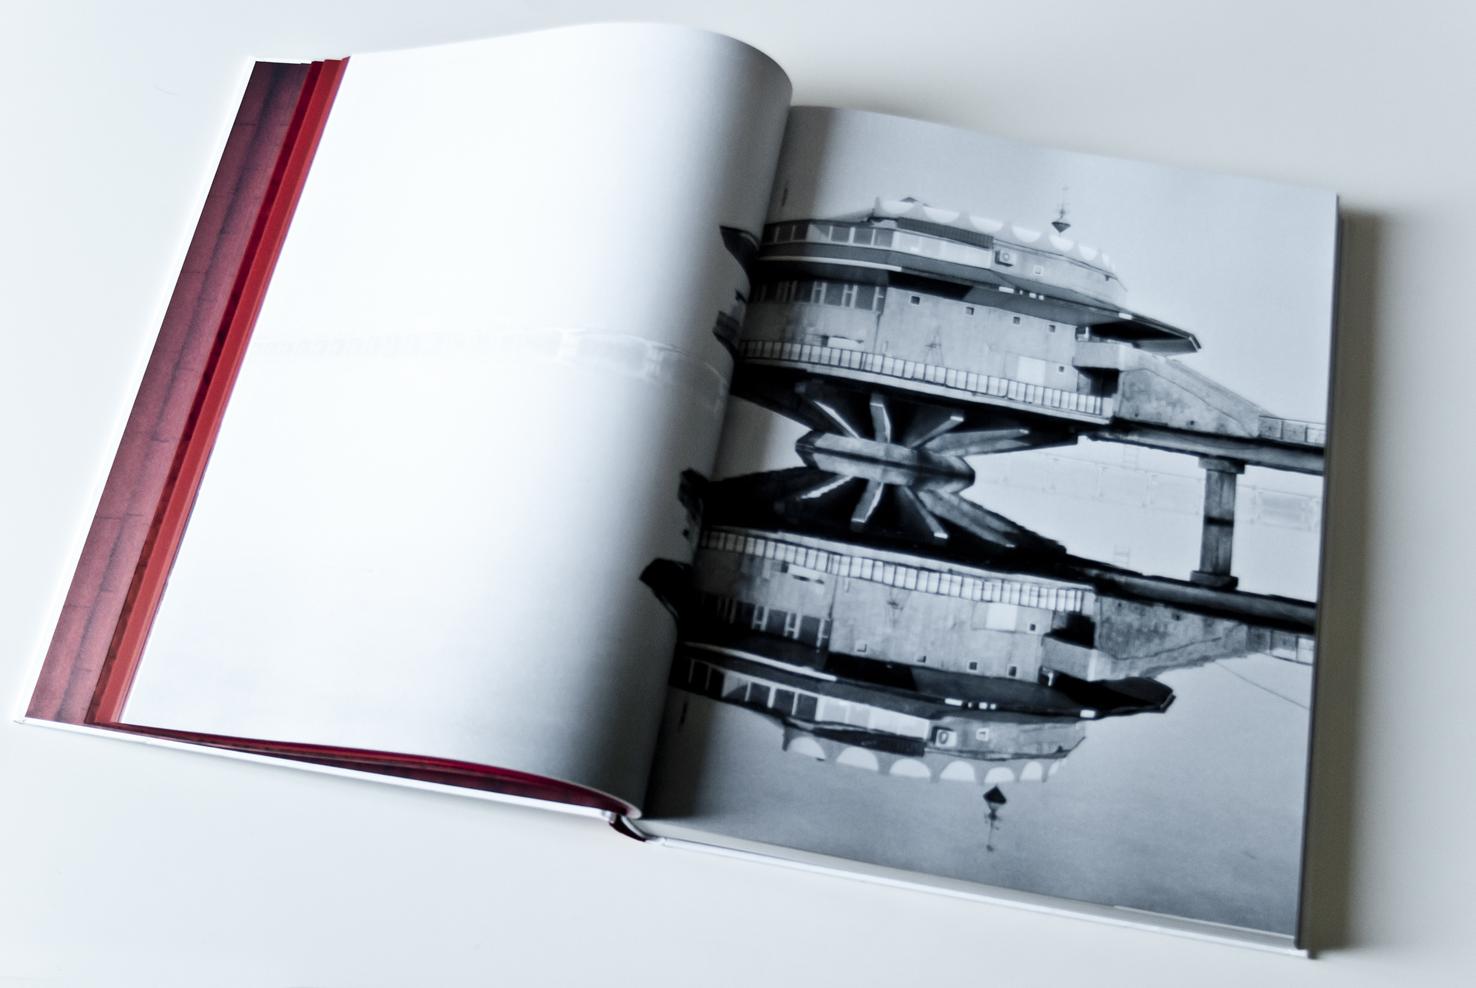 Книга Фредерика ШобанаCosmic Communist Constructions Photographed